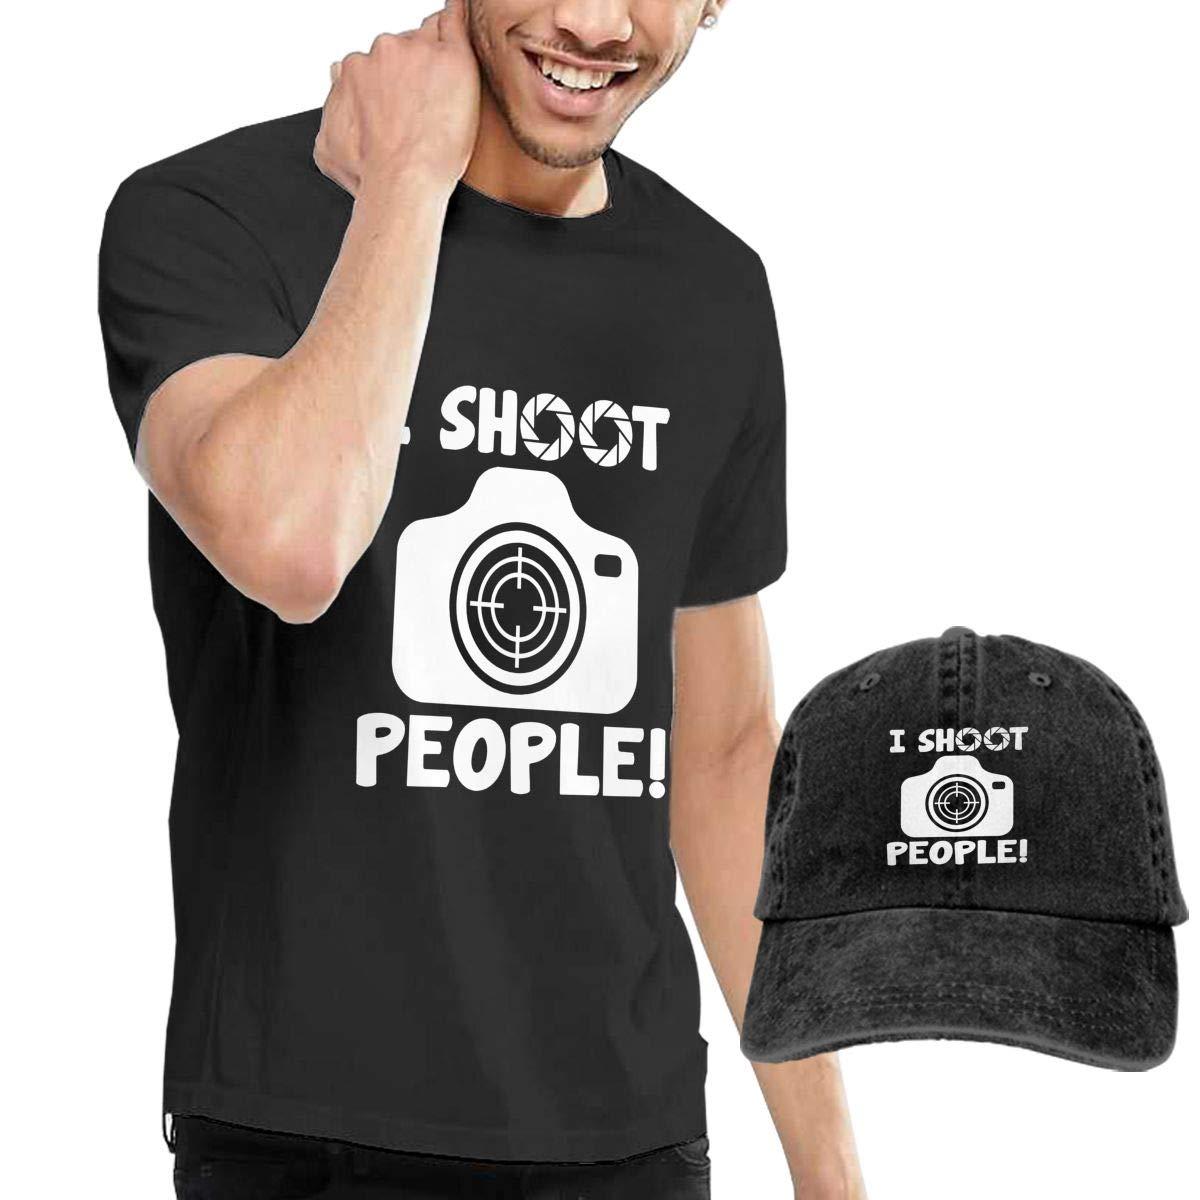 0f23c2b0 Black I SHOOT PEOPLE Mens ShortSleeve Shirt Jerseys And Denim Denim Denim  Cap Combo Set c0fde4